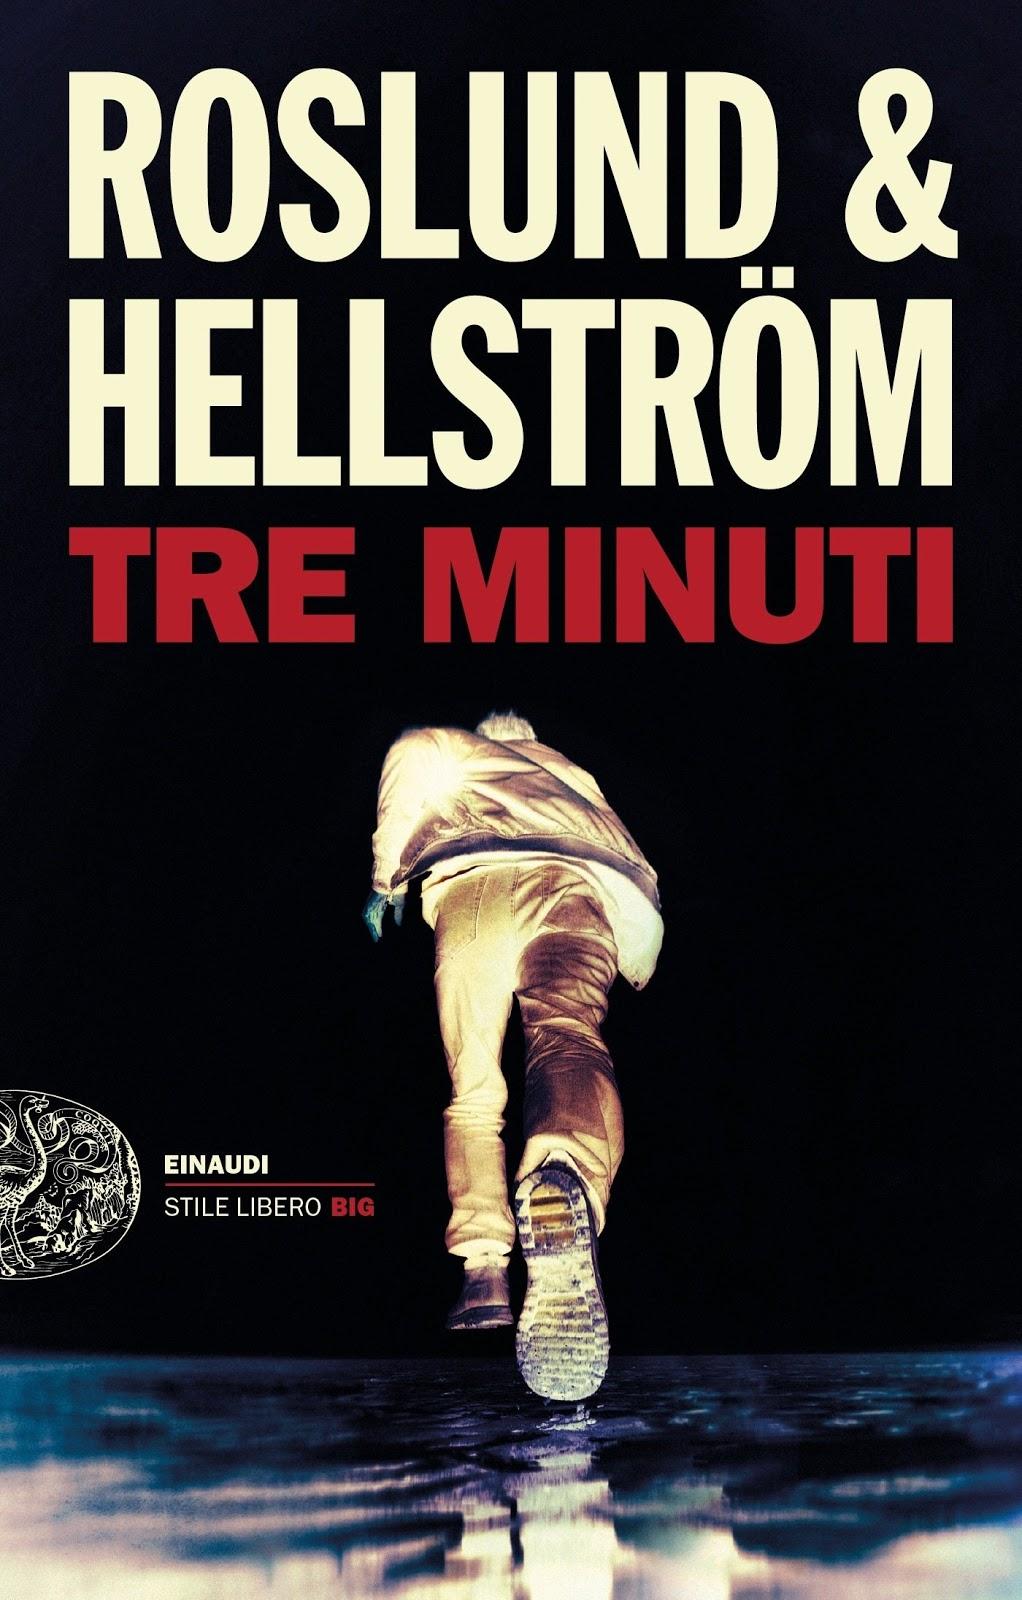 Tre minuti di Anders Roslund e Börge Hellström